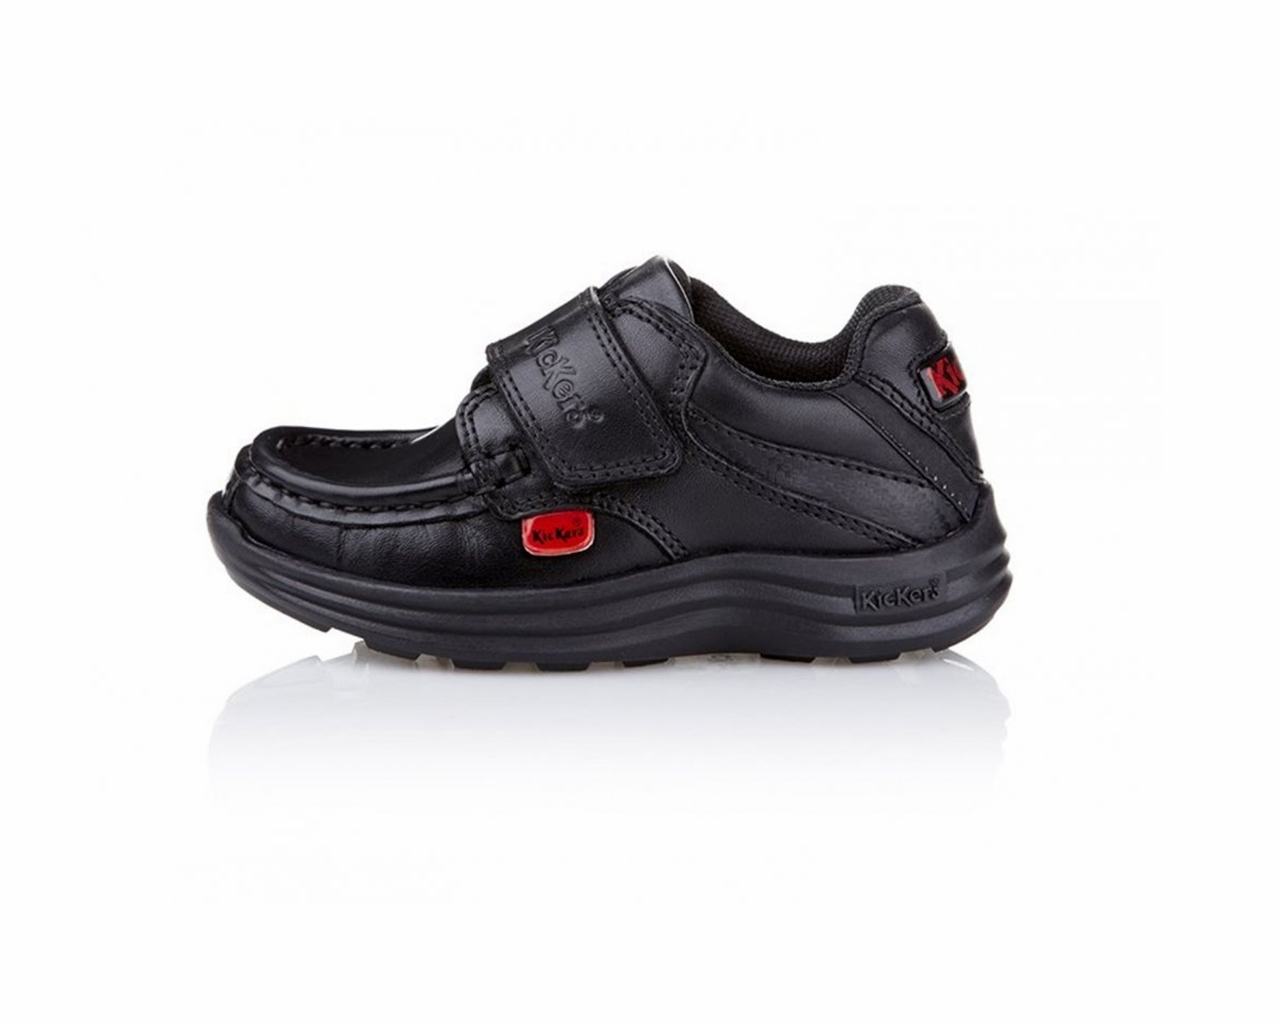 ce9e882c9 Oferta Infantil Kickers Reasan Tira i   M 112833 Cuero Negro Zapatos ...